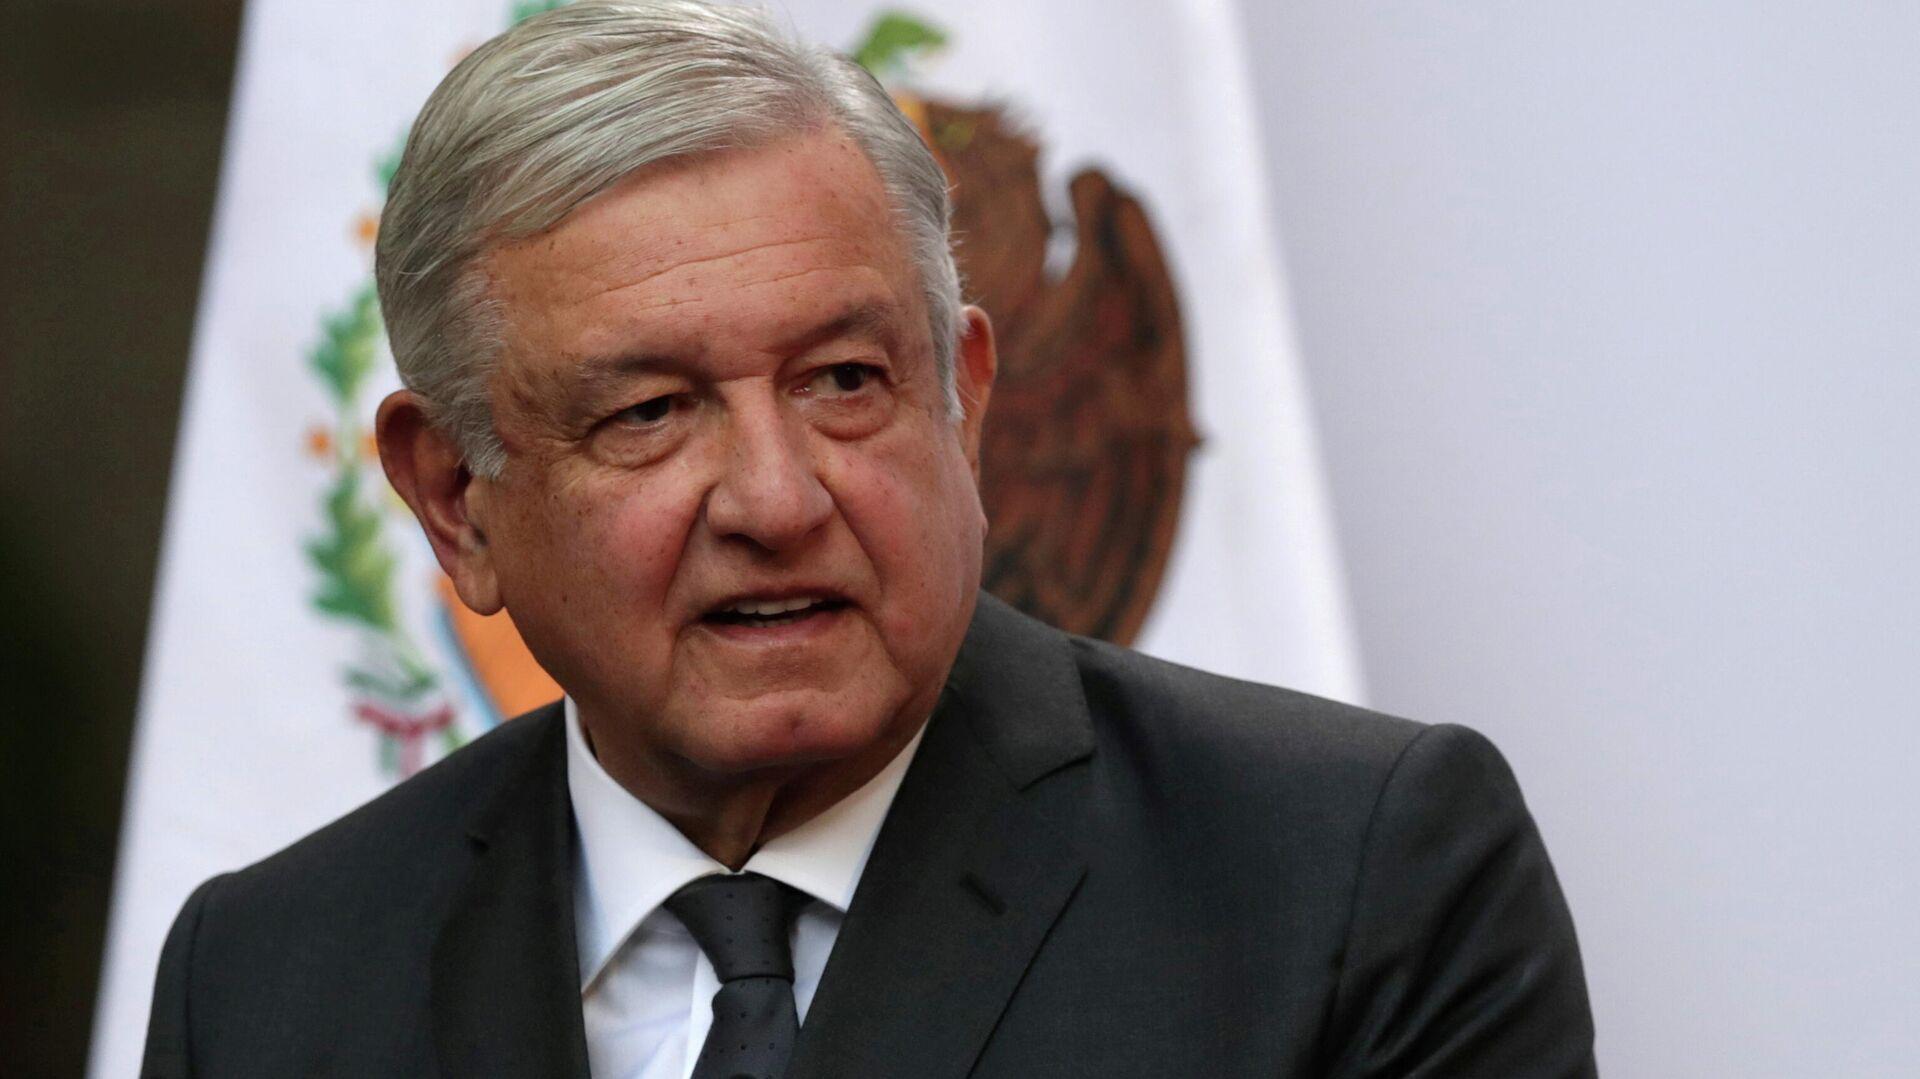 El presidente de México, Andrés Manuel López Obrador - Sputnik Mundo, 1920, 18.03.2021